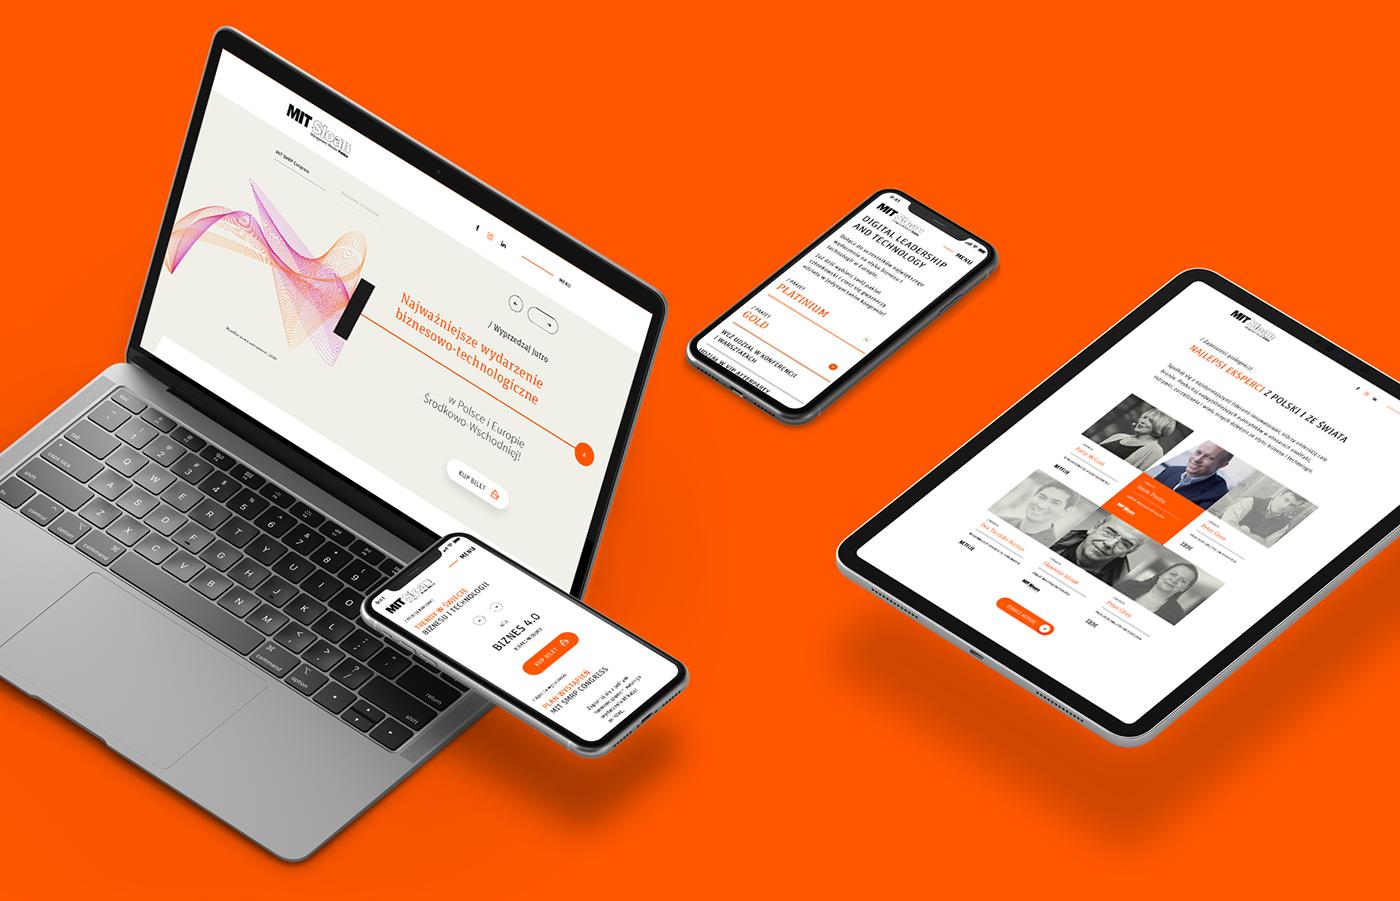 abstract conference Event landingpage minimal orange Website Meet MIT Technology